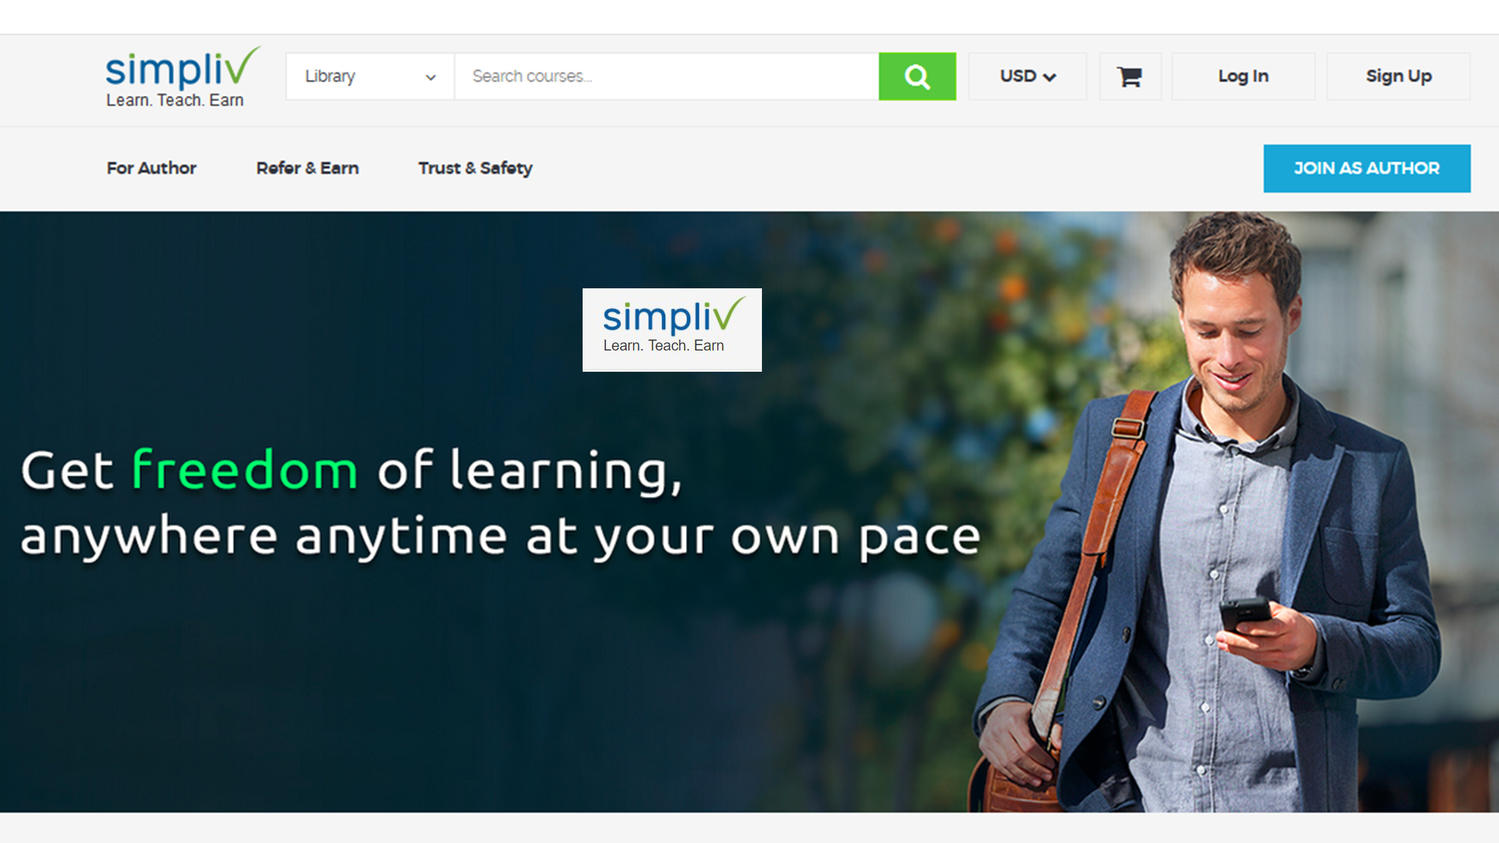 SimplivLearning.com